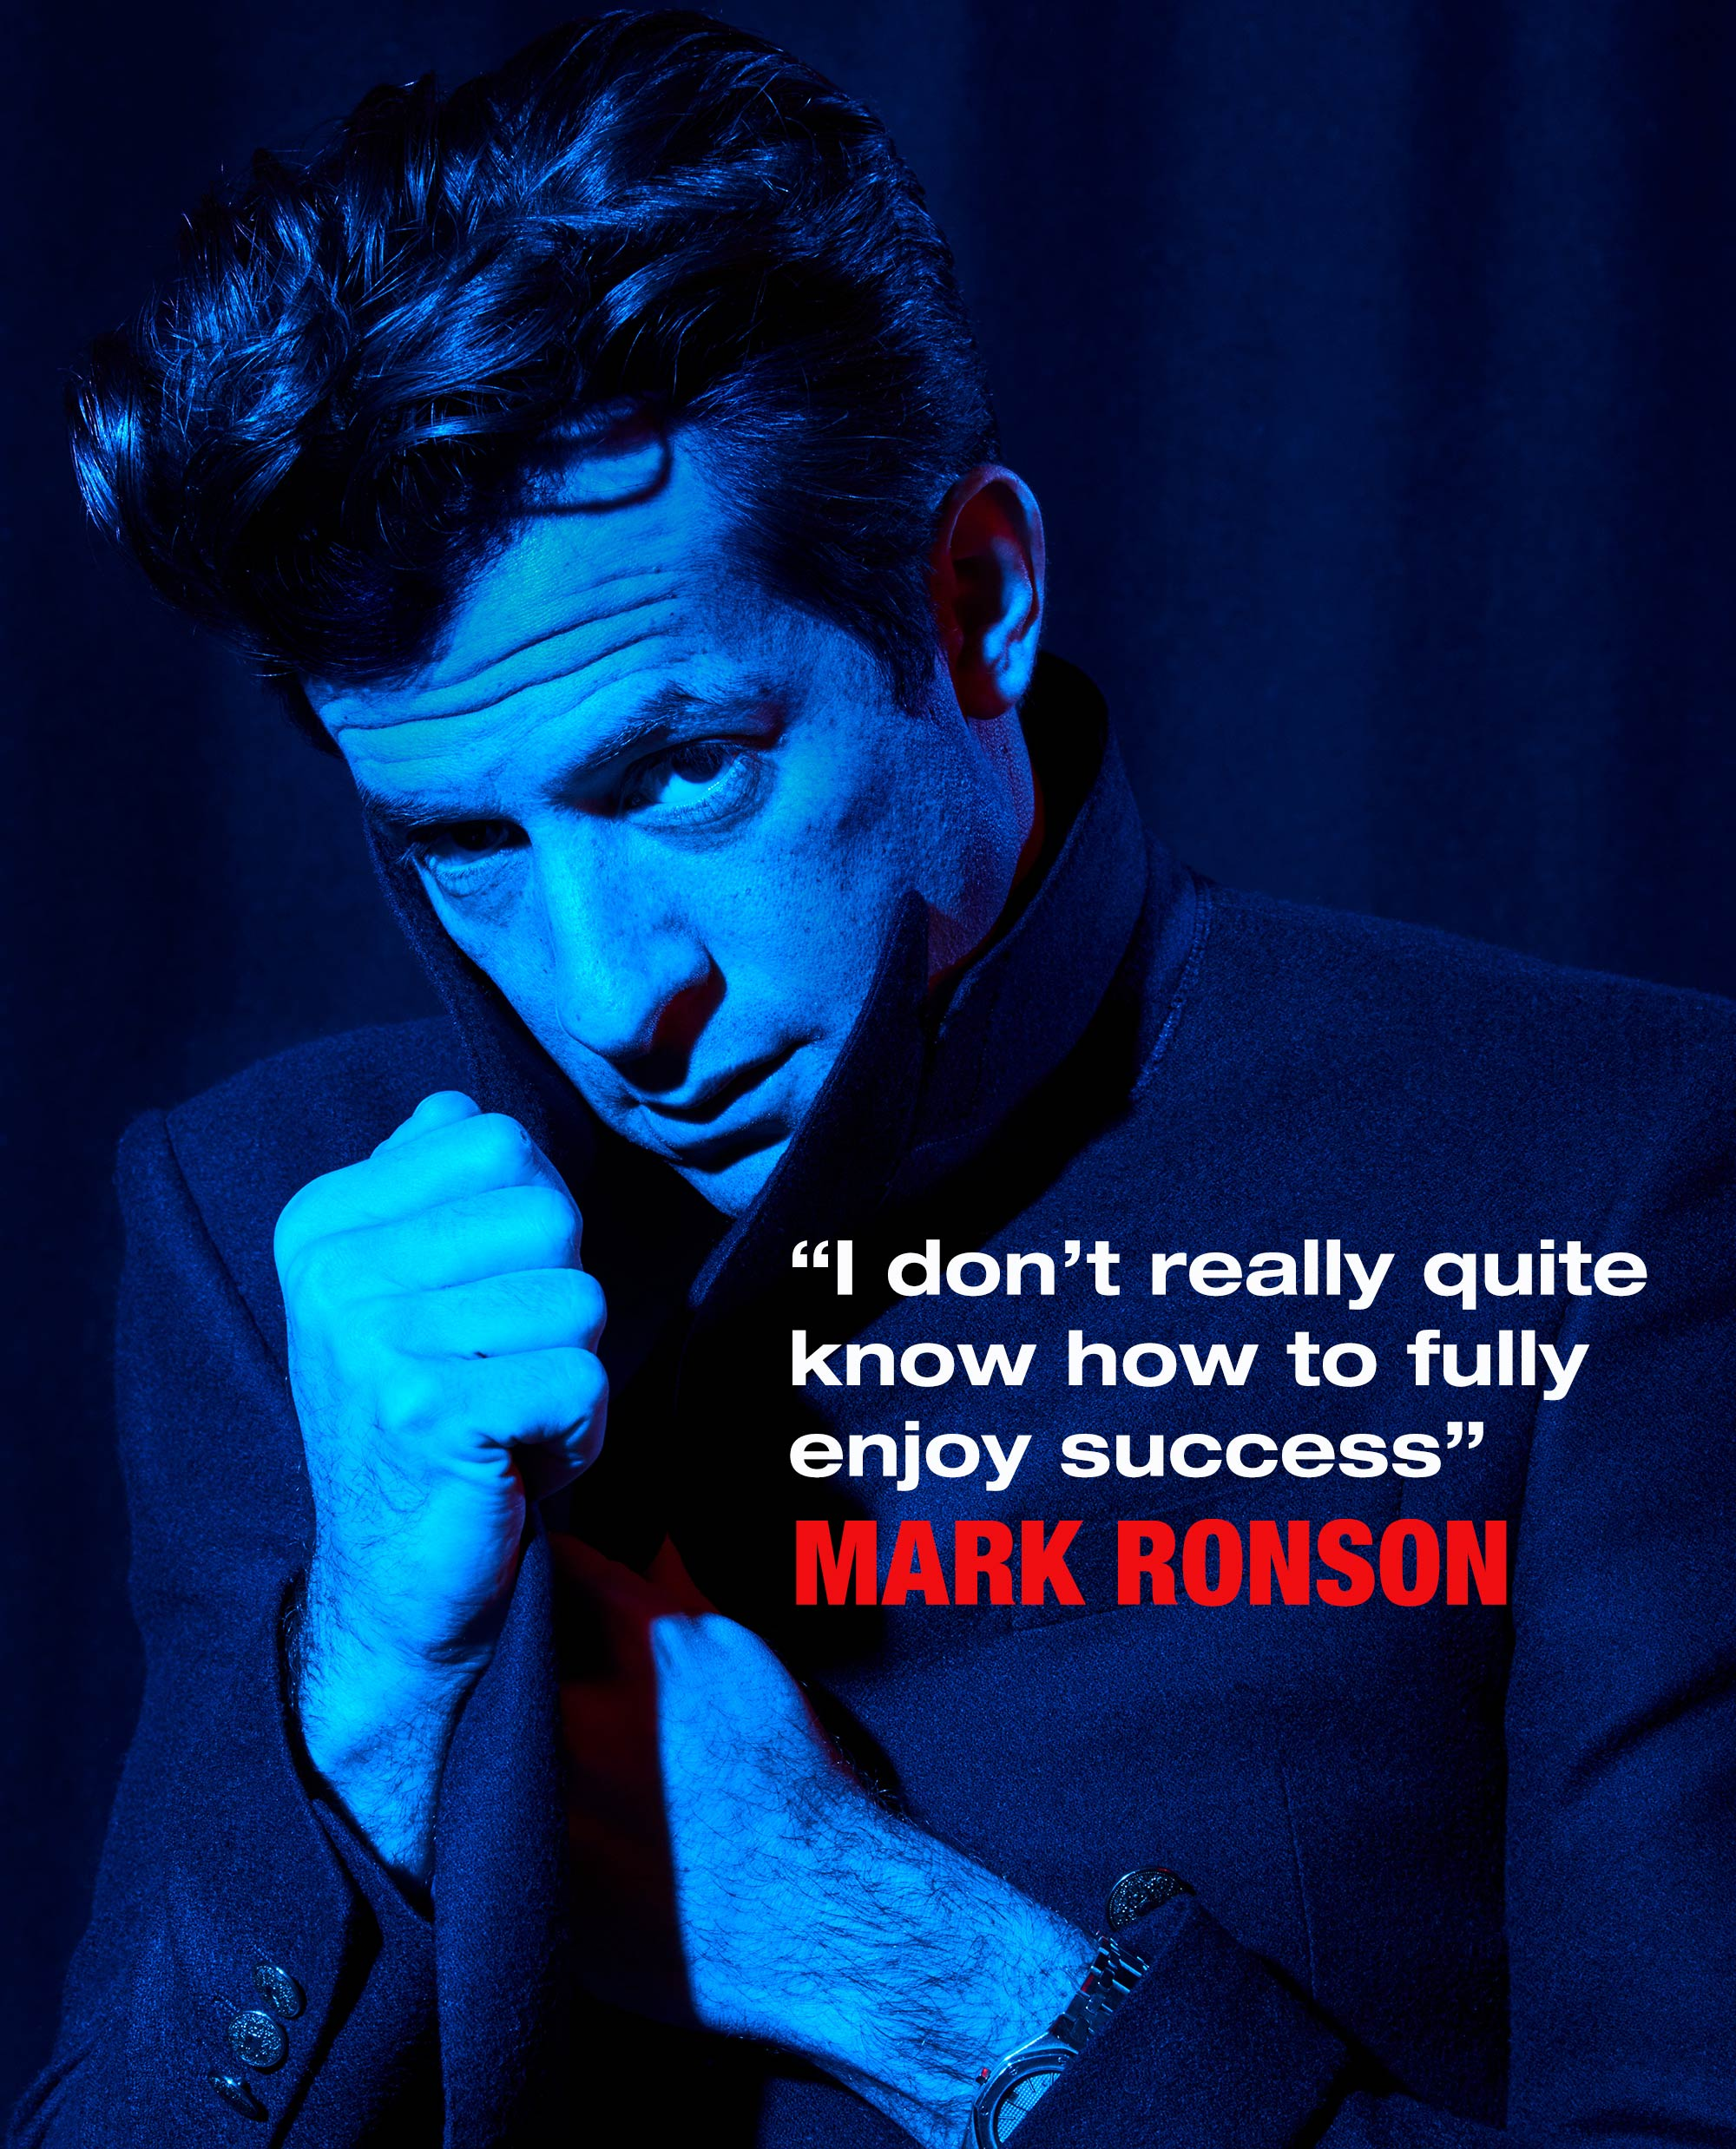 Mark Ronson NME